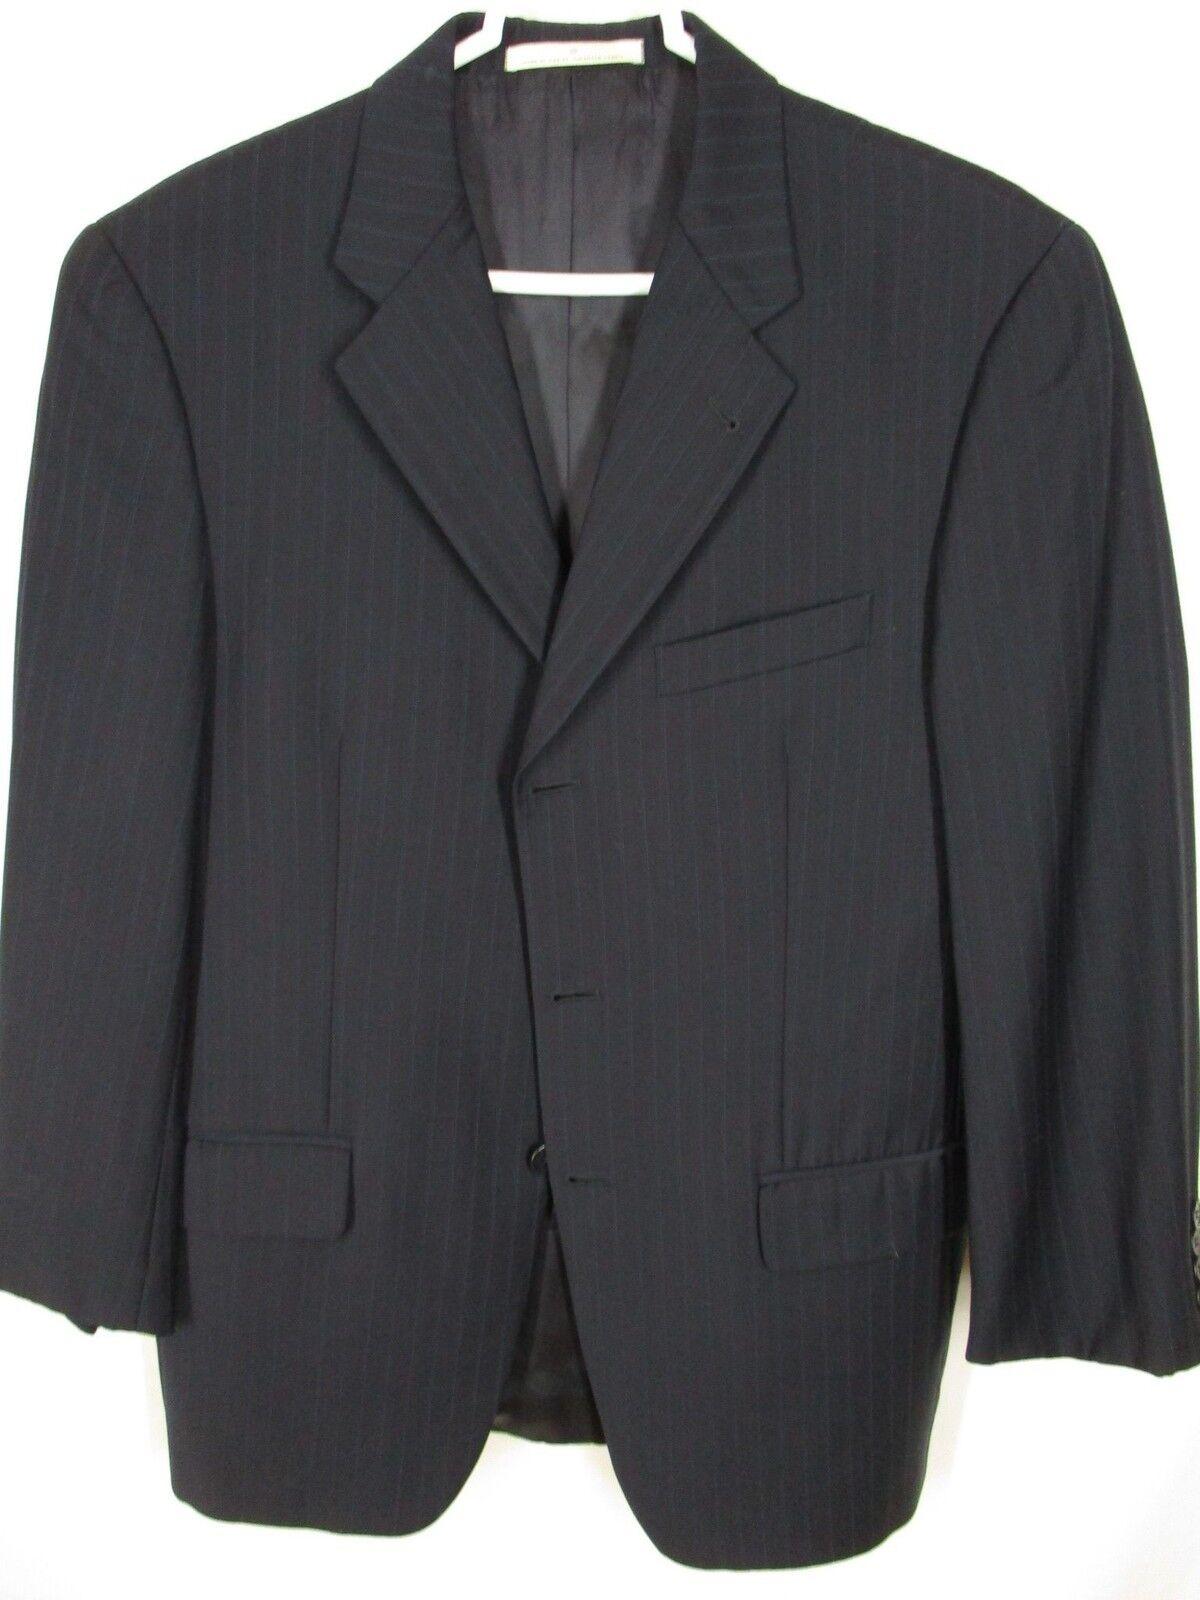 Joseph Abboud Mens Navy Stripe 3 Btn Suit 38S USA Made